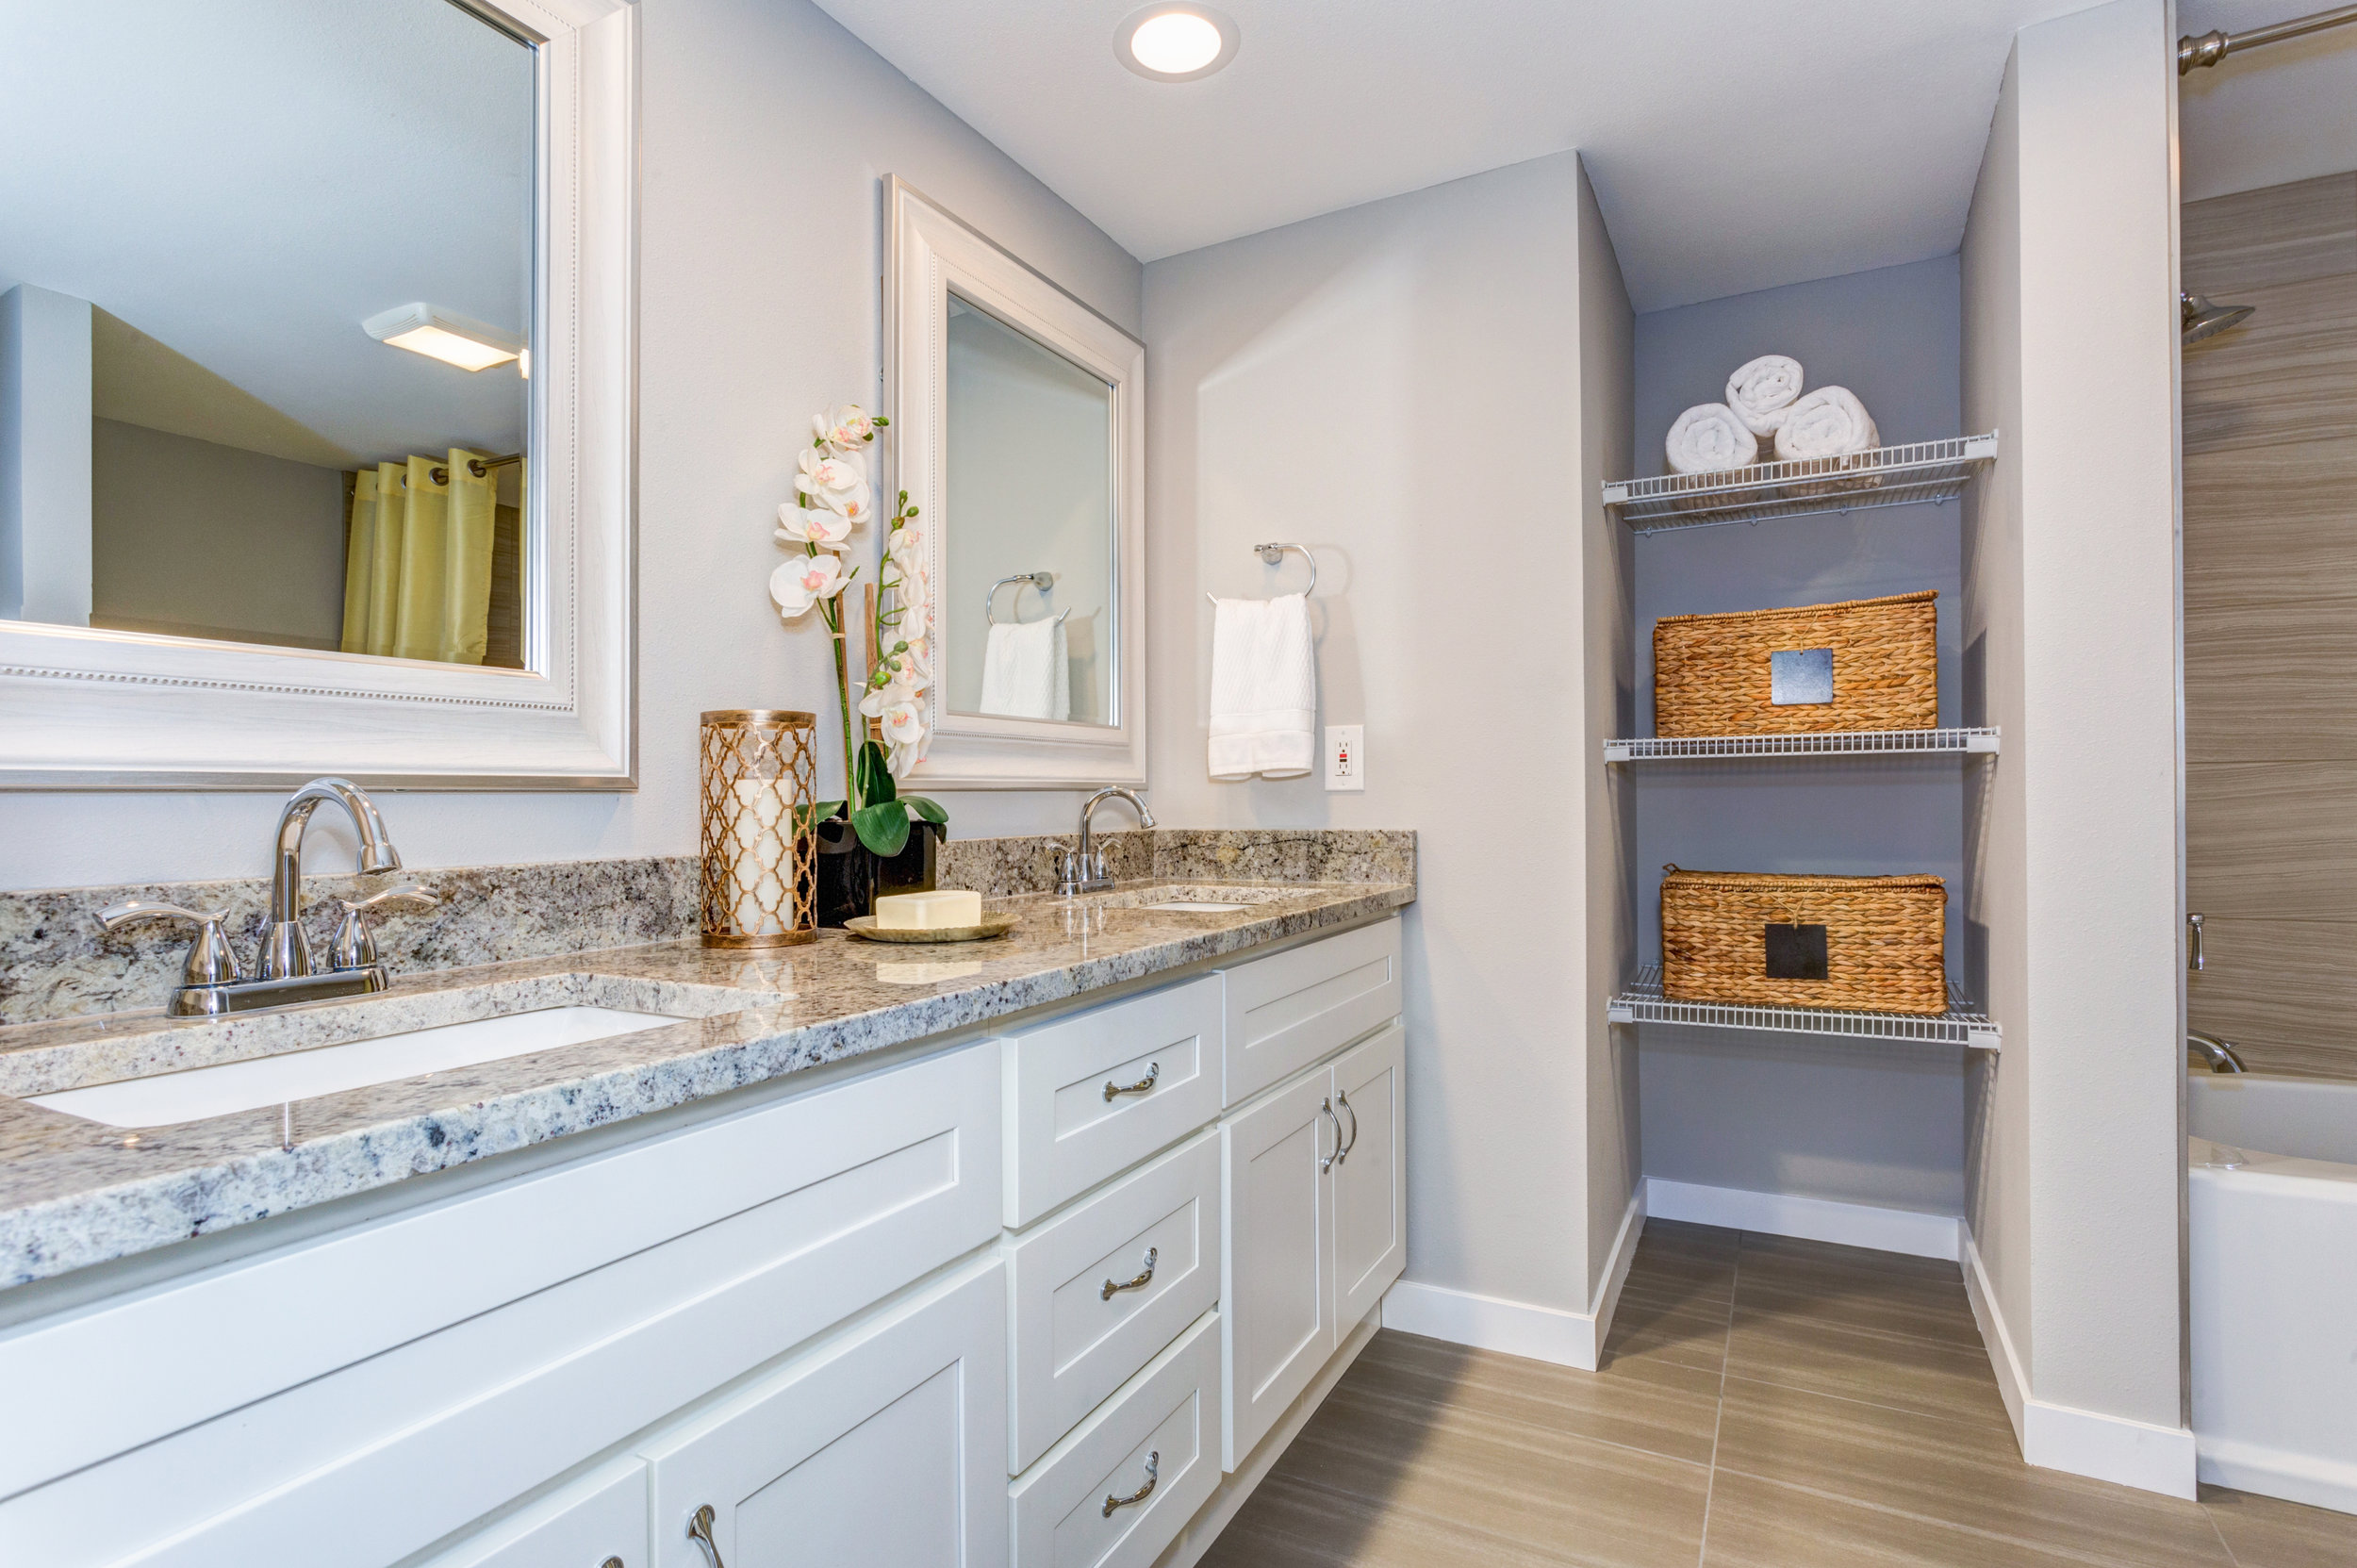 Elegant bathroom with long white vanity cabinet